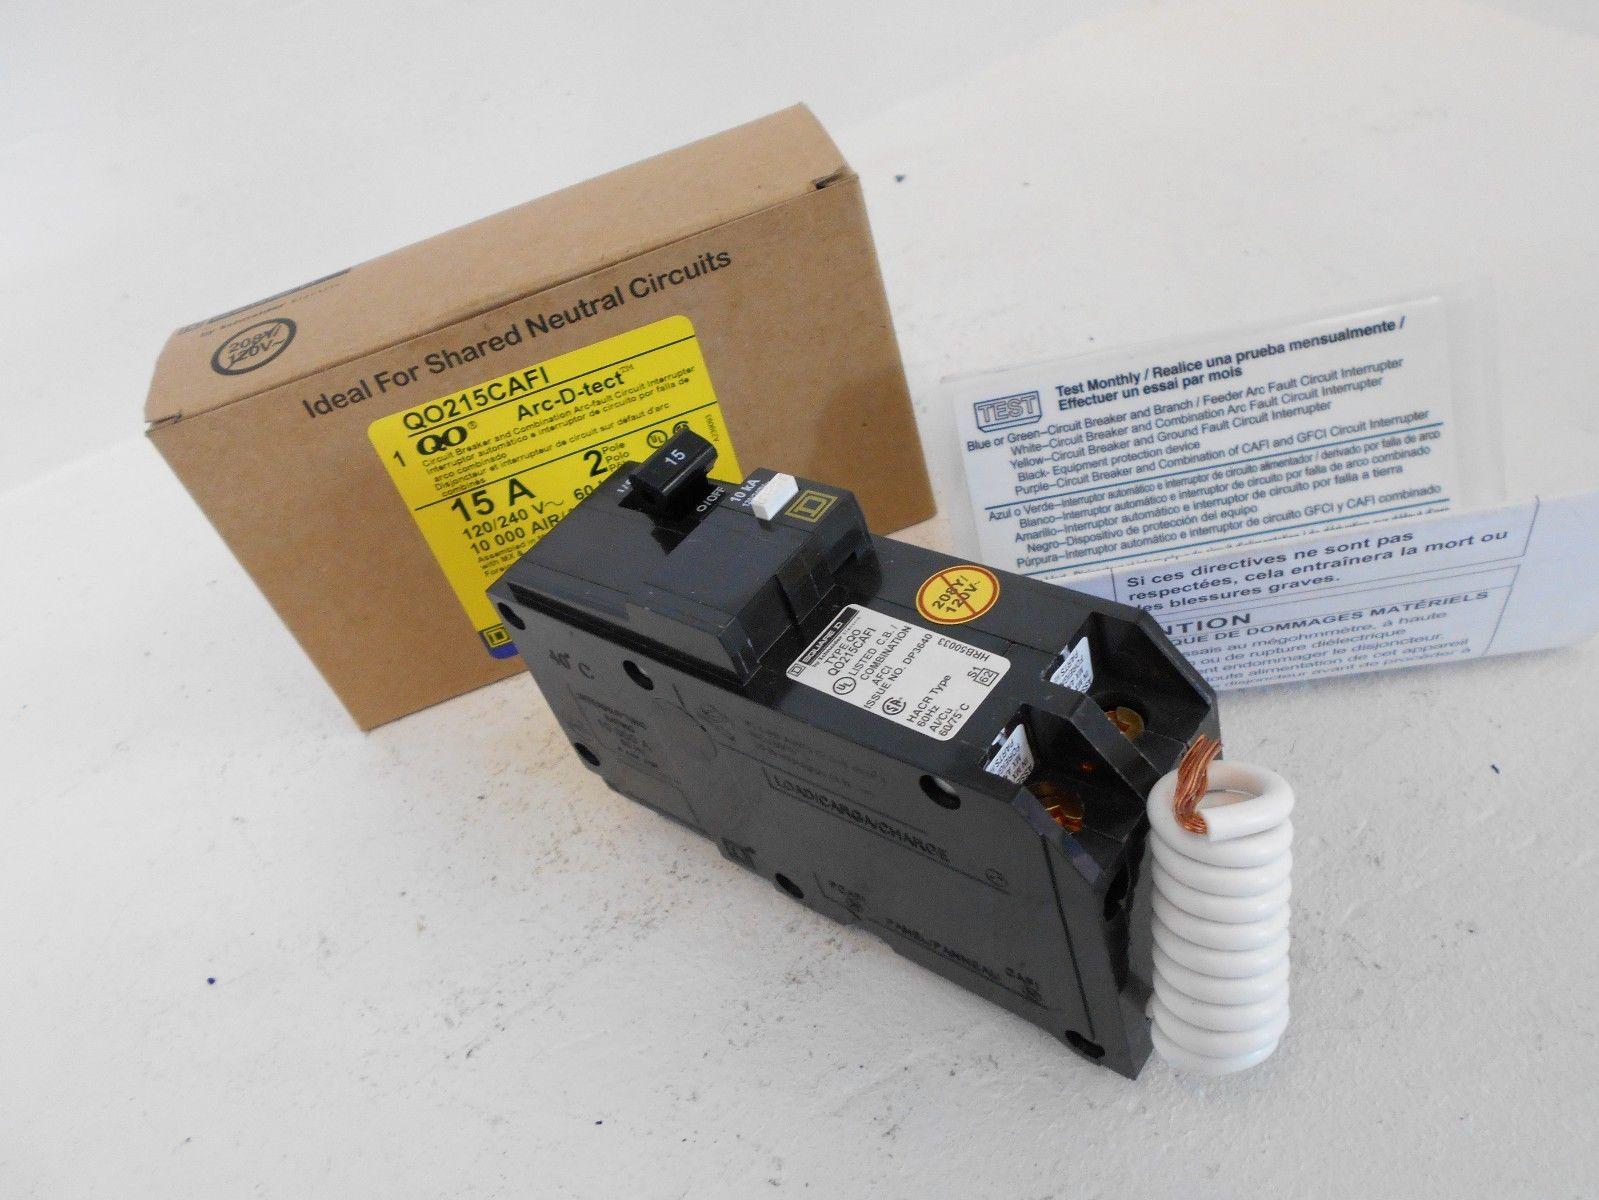 New Square D Qo215cafi 2 Pole 15 Amp 120 240v Combination Arc Fault Circuit Breakers Breaker 15a